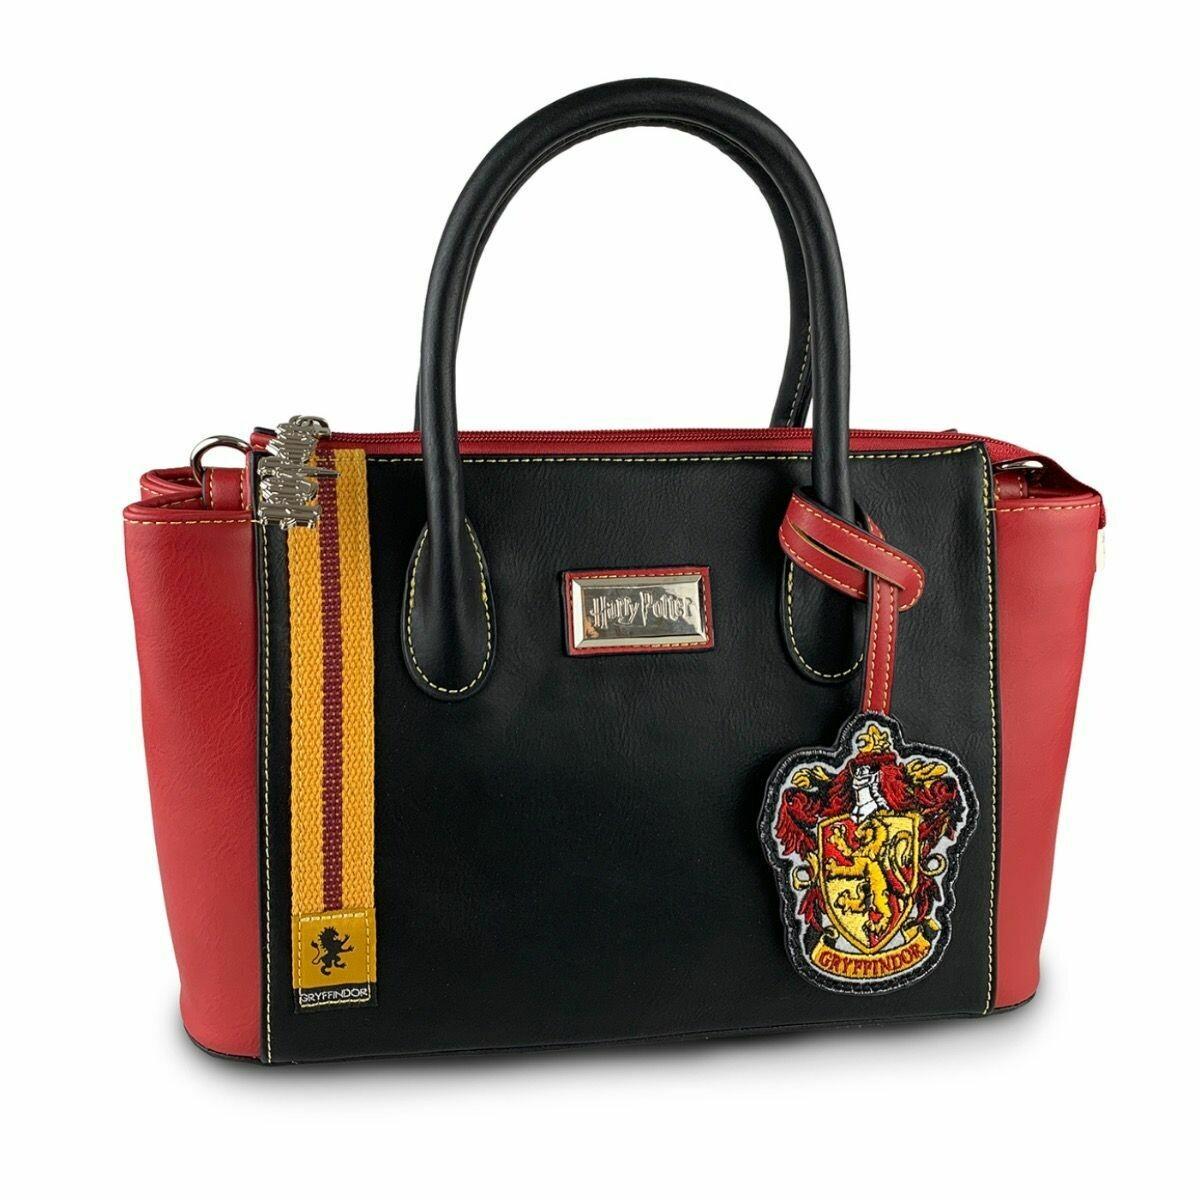 Bolsa Harry Potter EX Gryffindor